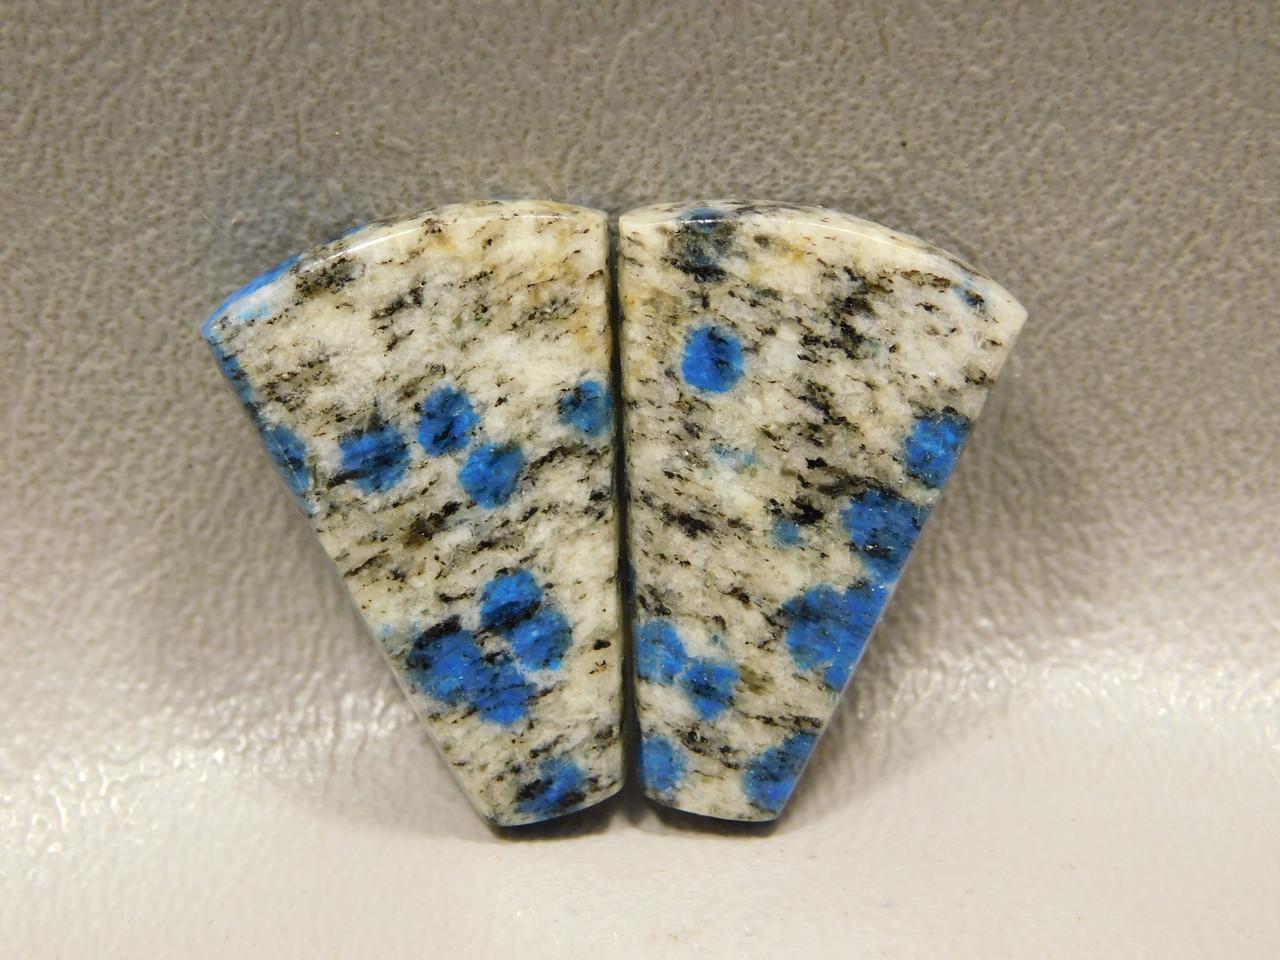 Cabochons K2 Custom Cut Stone Matched Pair Gemstone #6